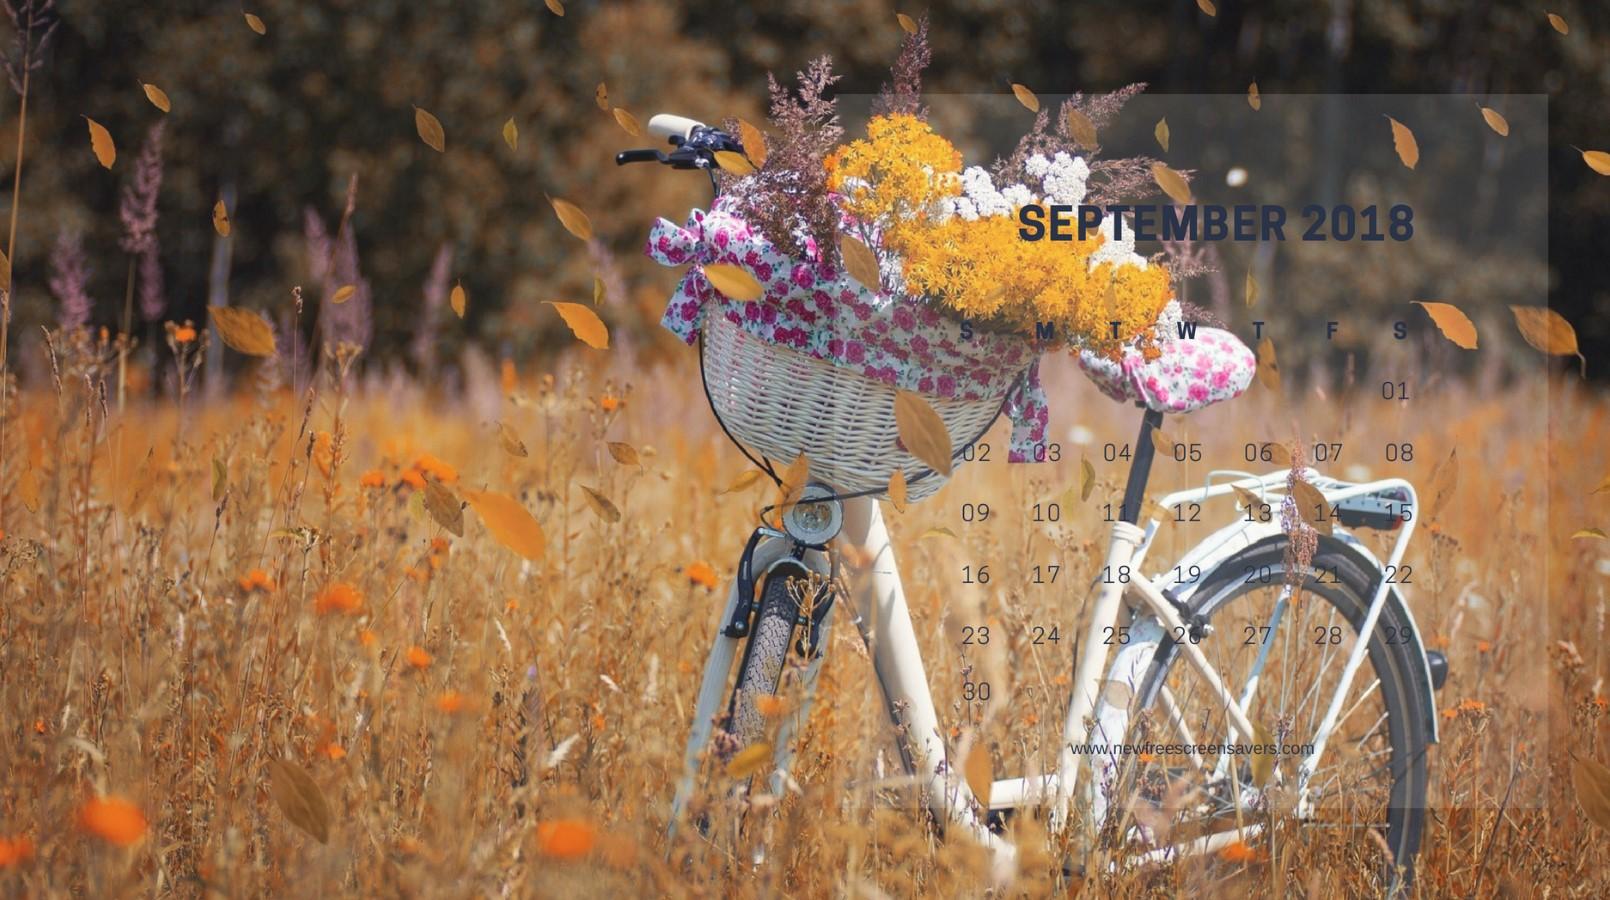 All Photos Gallery Desktop Wallpapers Free Desktop: Desktop Wallpapers With A Calendar For September